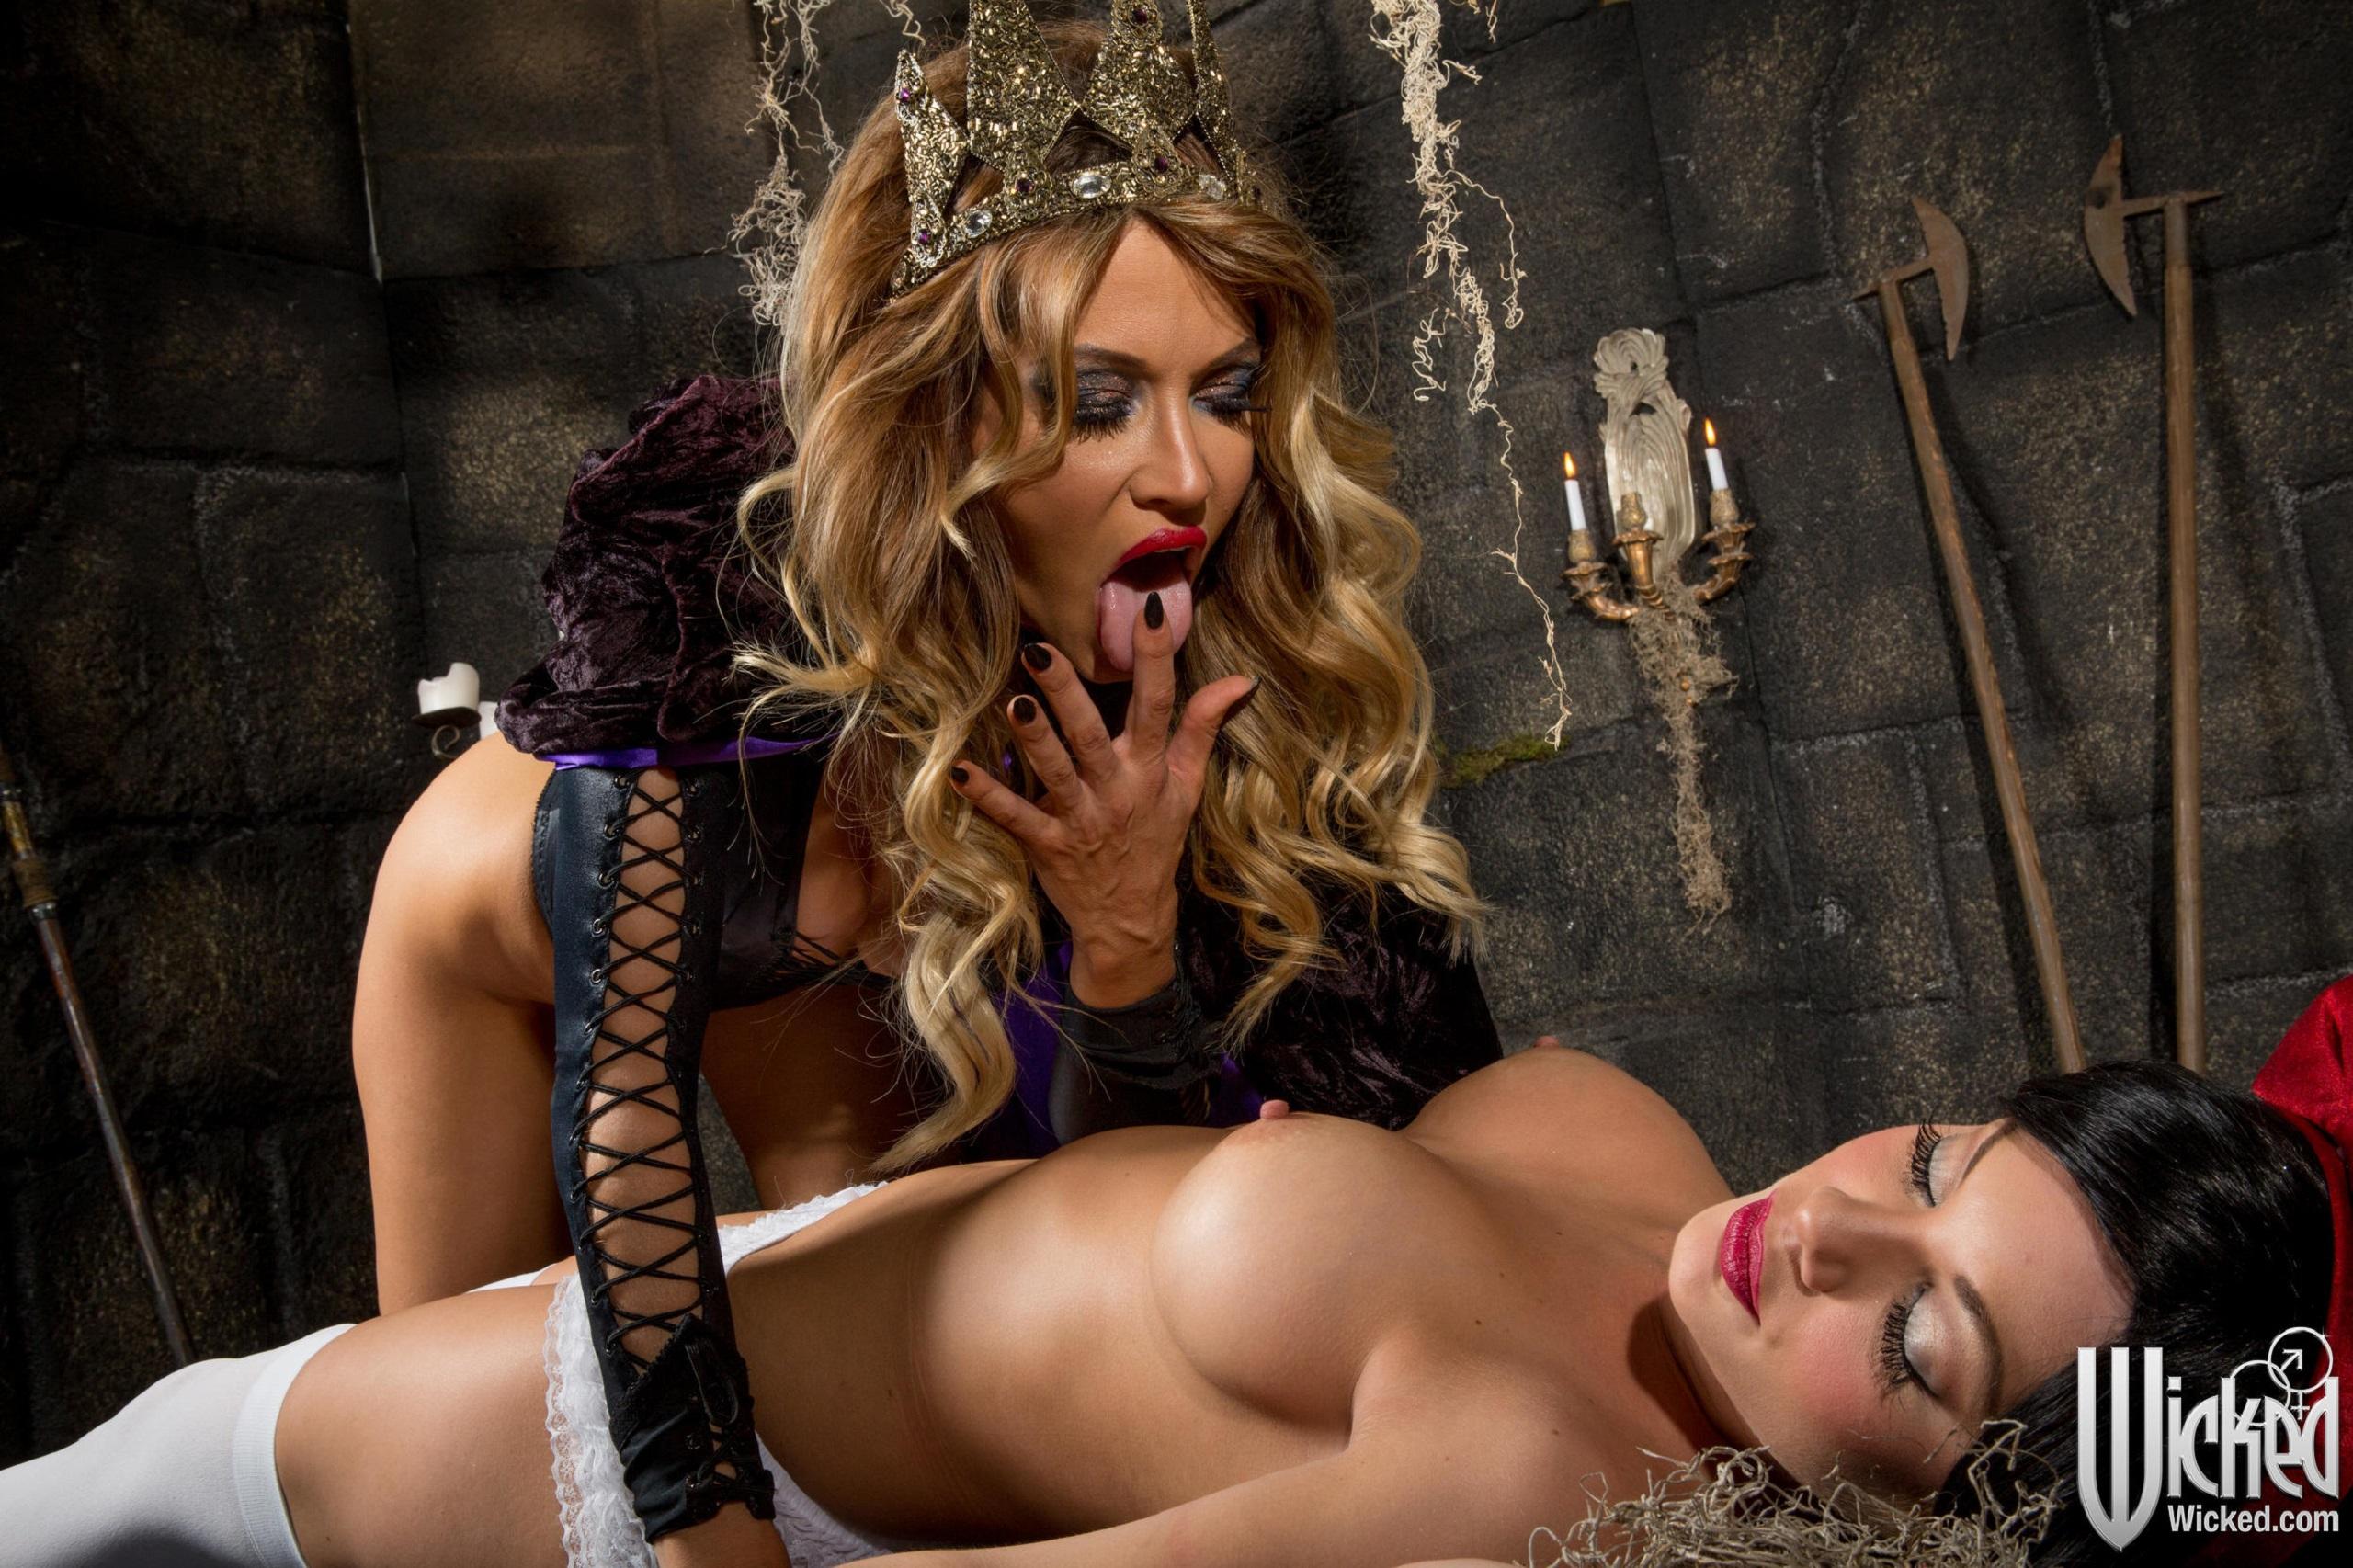 Wicked erotic nude beauty on the floor